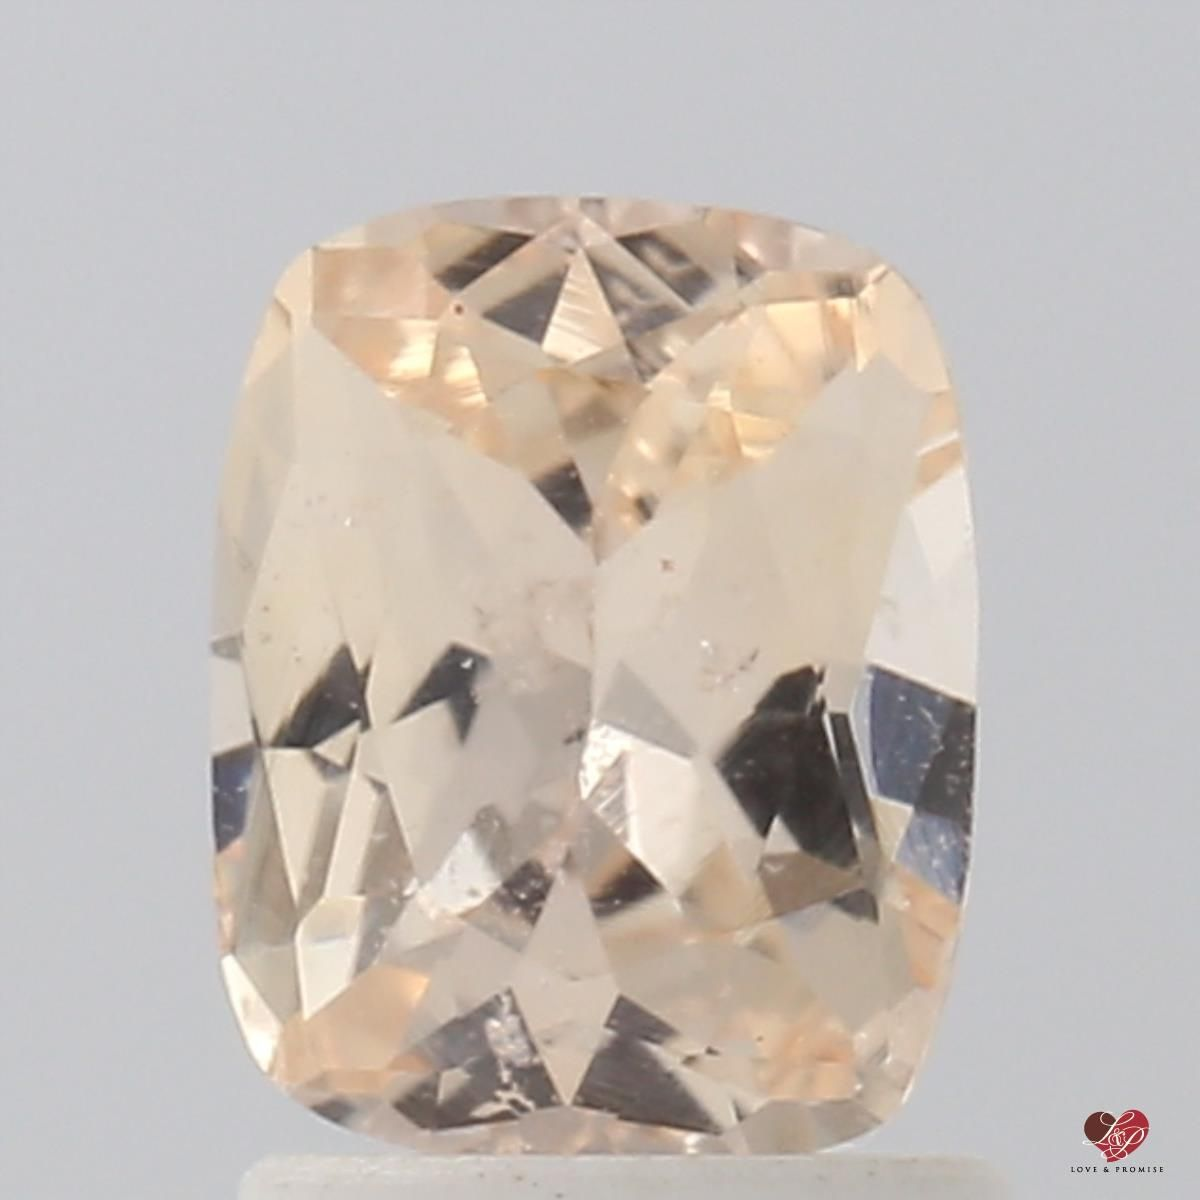 https://www.loveandpromisejewelers.com/media/catalog/product/cache/1b8ff75e92e9e3eb7d814fc024f6d8df/s/t/still_7_16.jpg